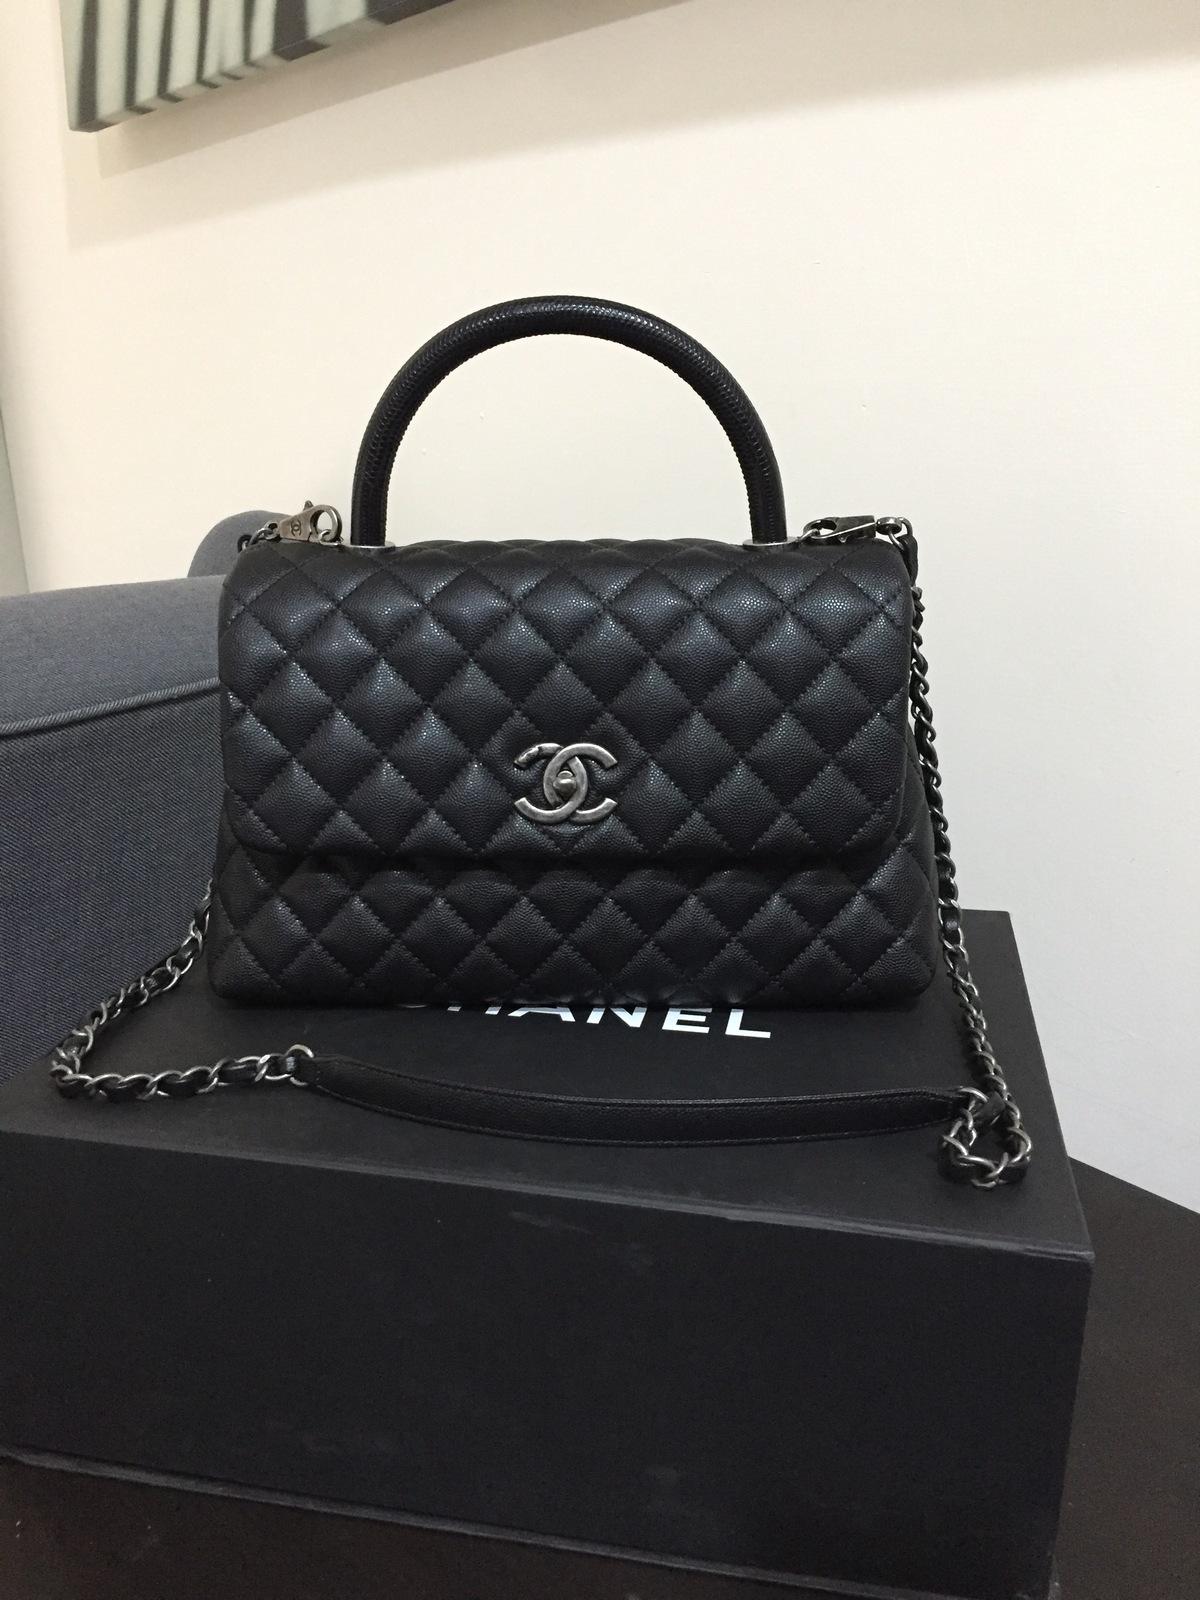 d85810c27a6d1f 100 Auth New Chanel 2016 2017 Medium Python Coco Handle Bag Black